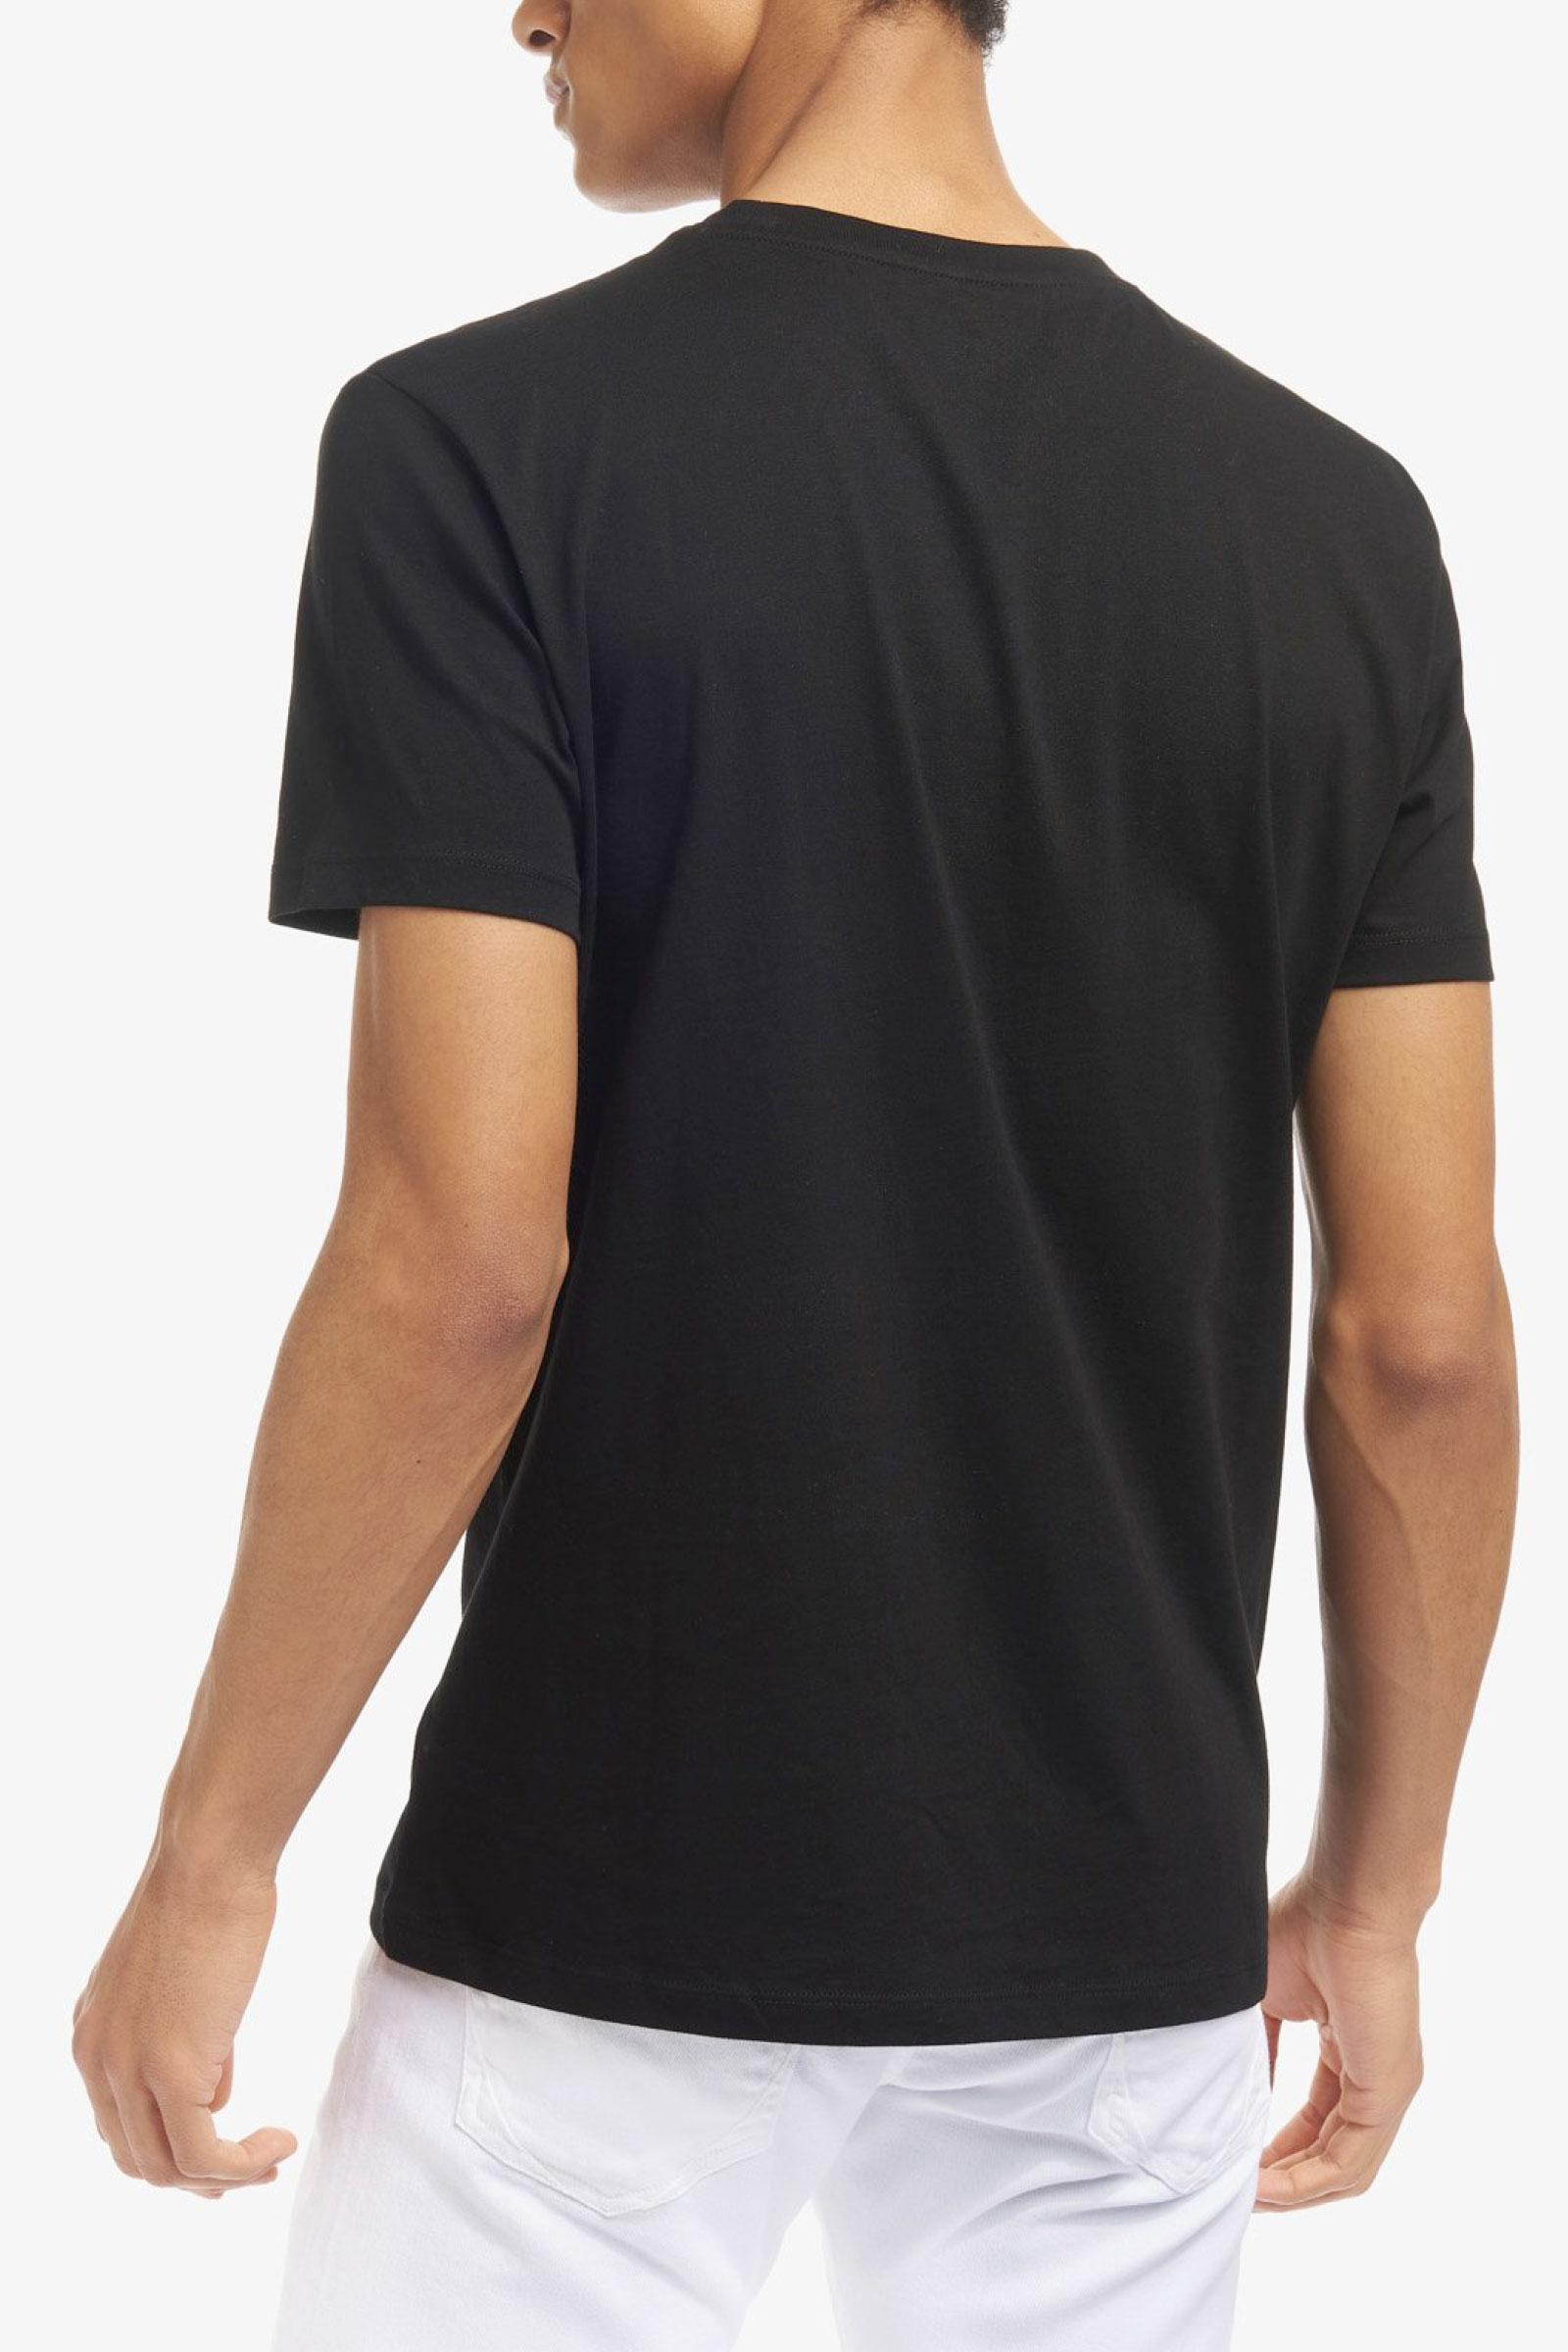 BLAUER Men's T-Shirt BLAUER | T-Shirt | 21SBLUH02334999